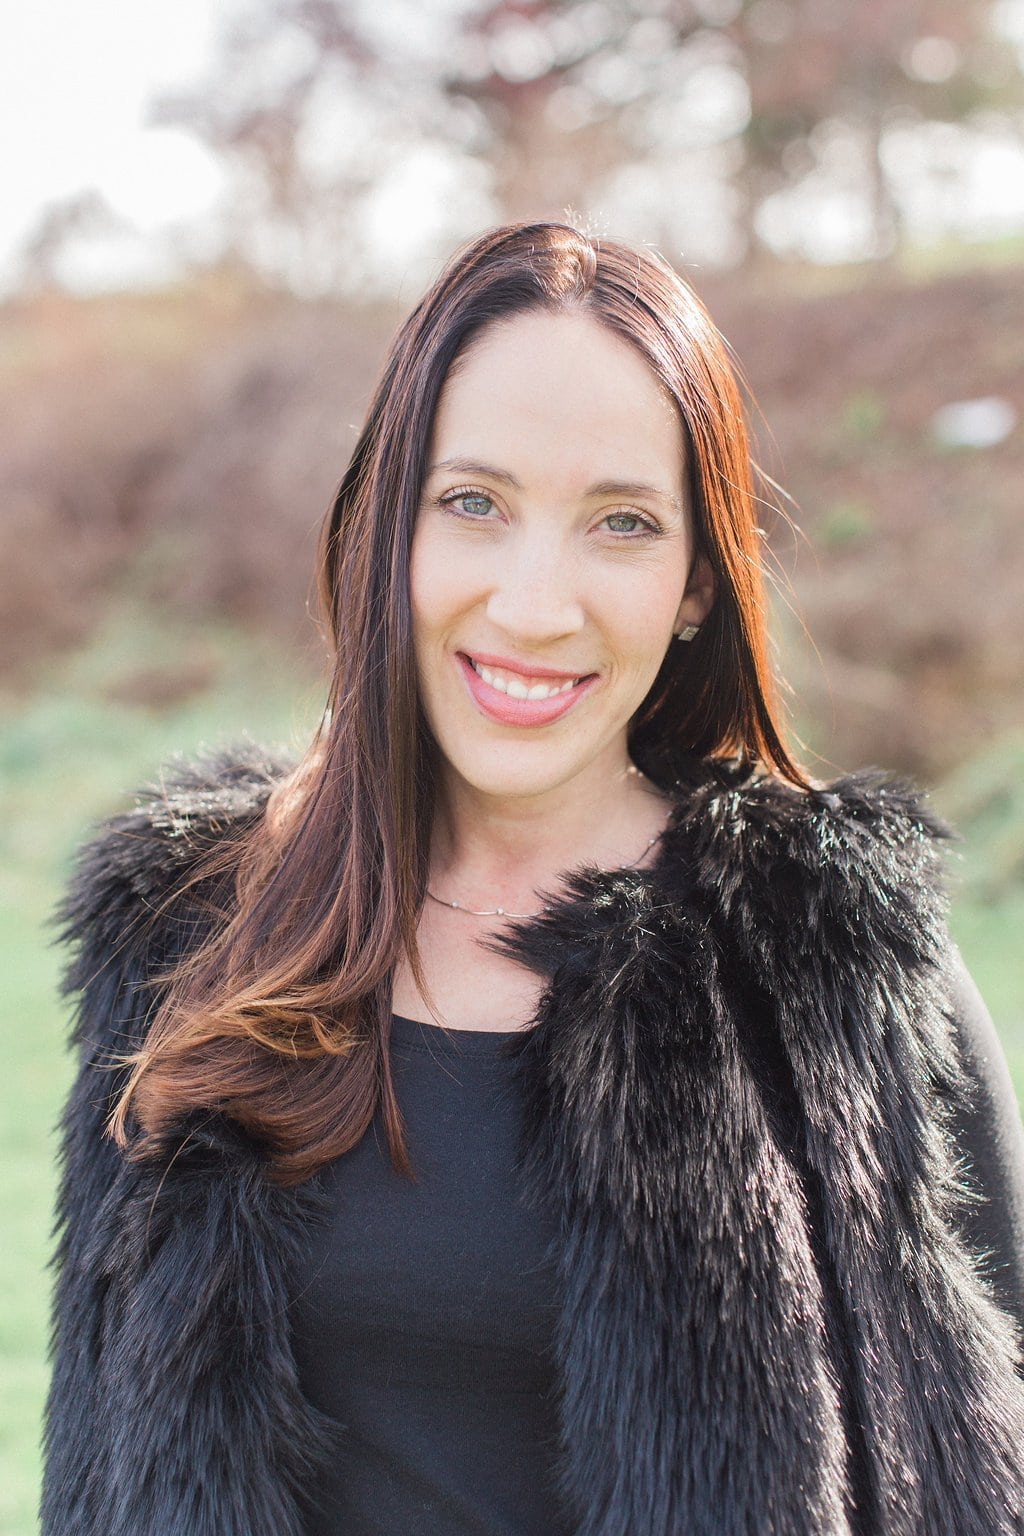 Woman posing for a photograph wearing a black fur vest